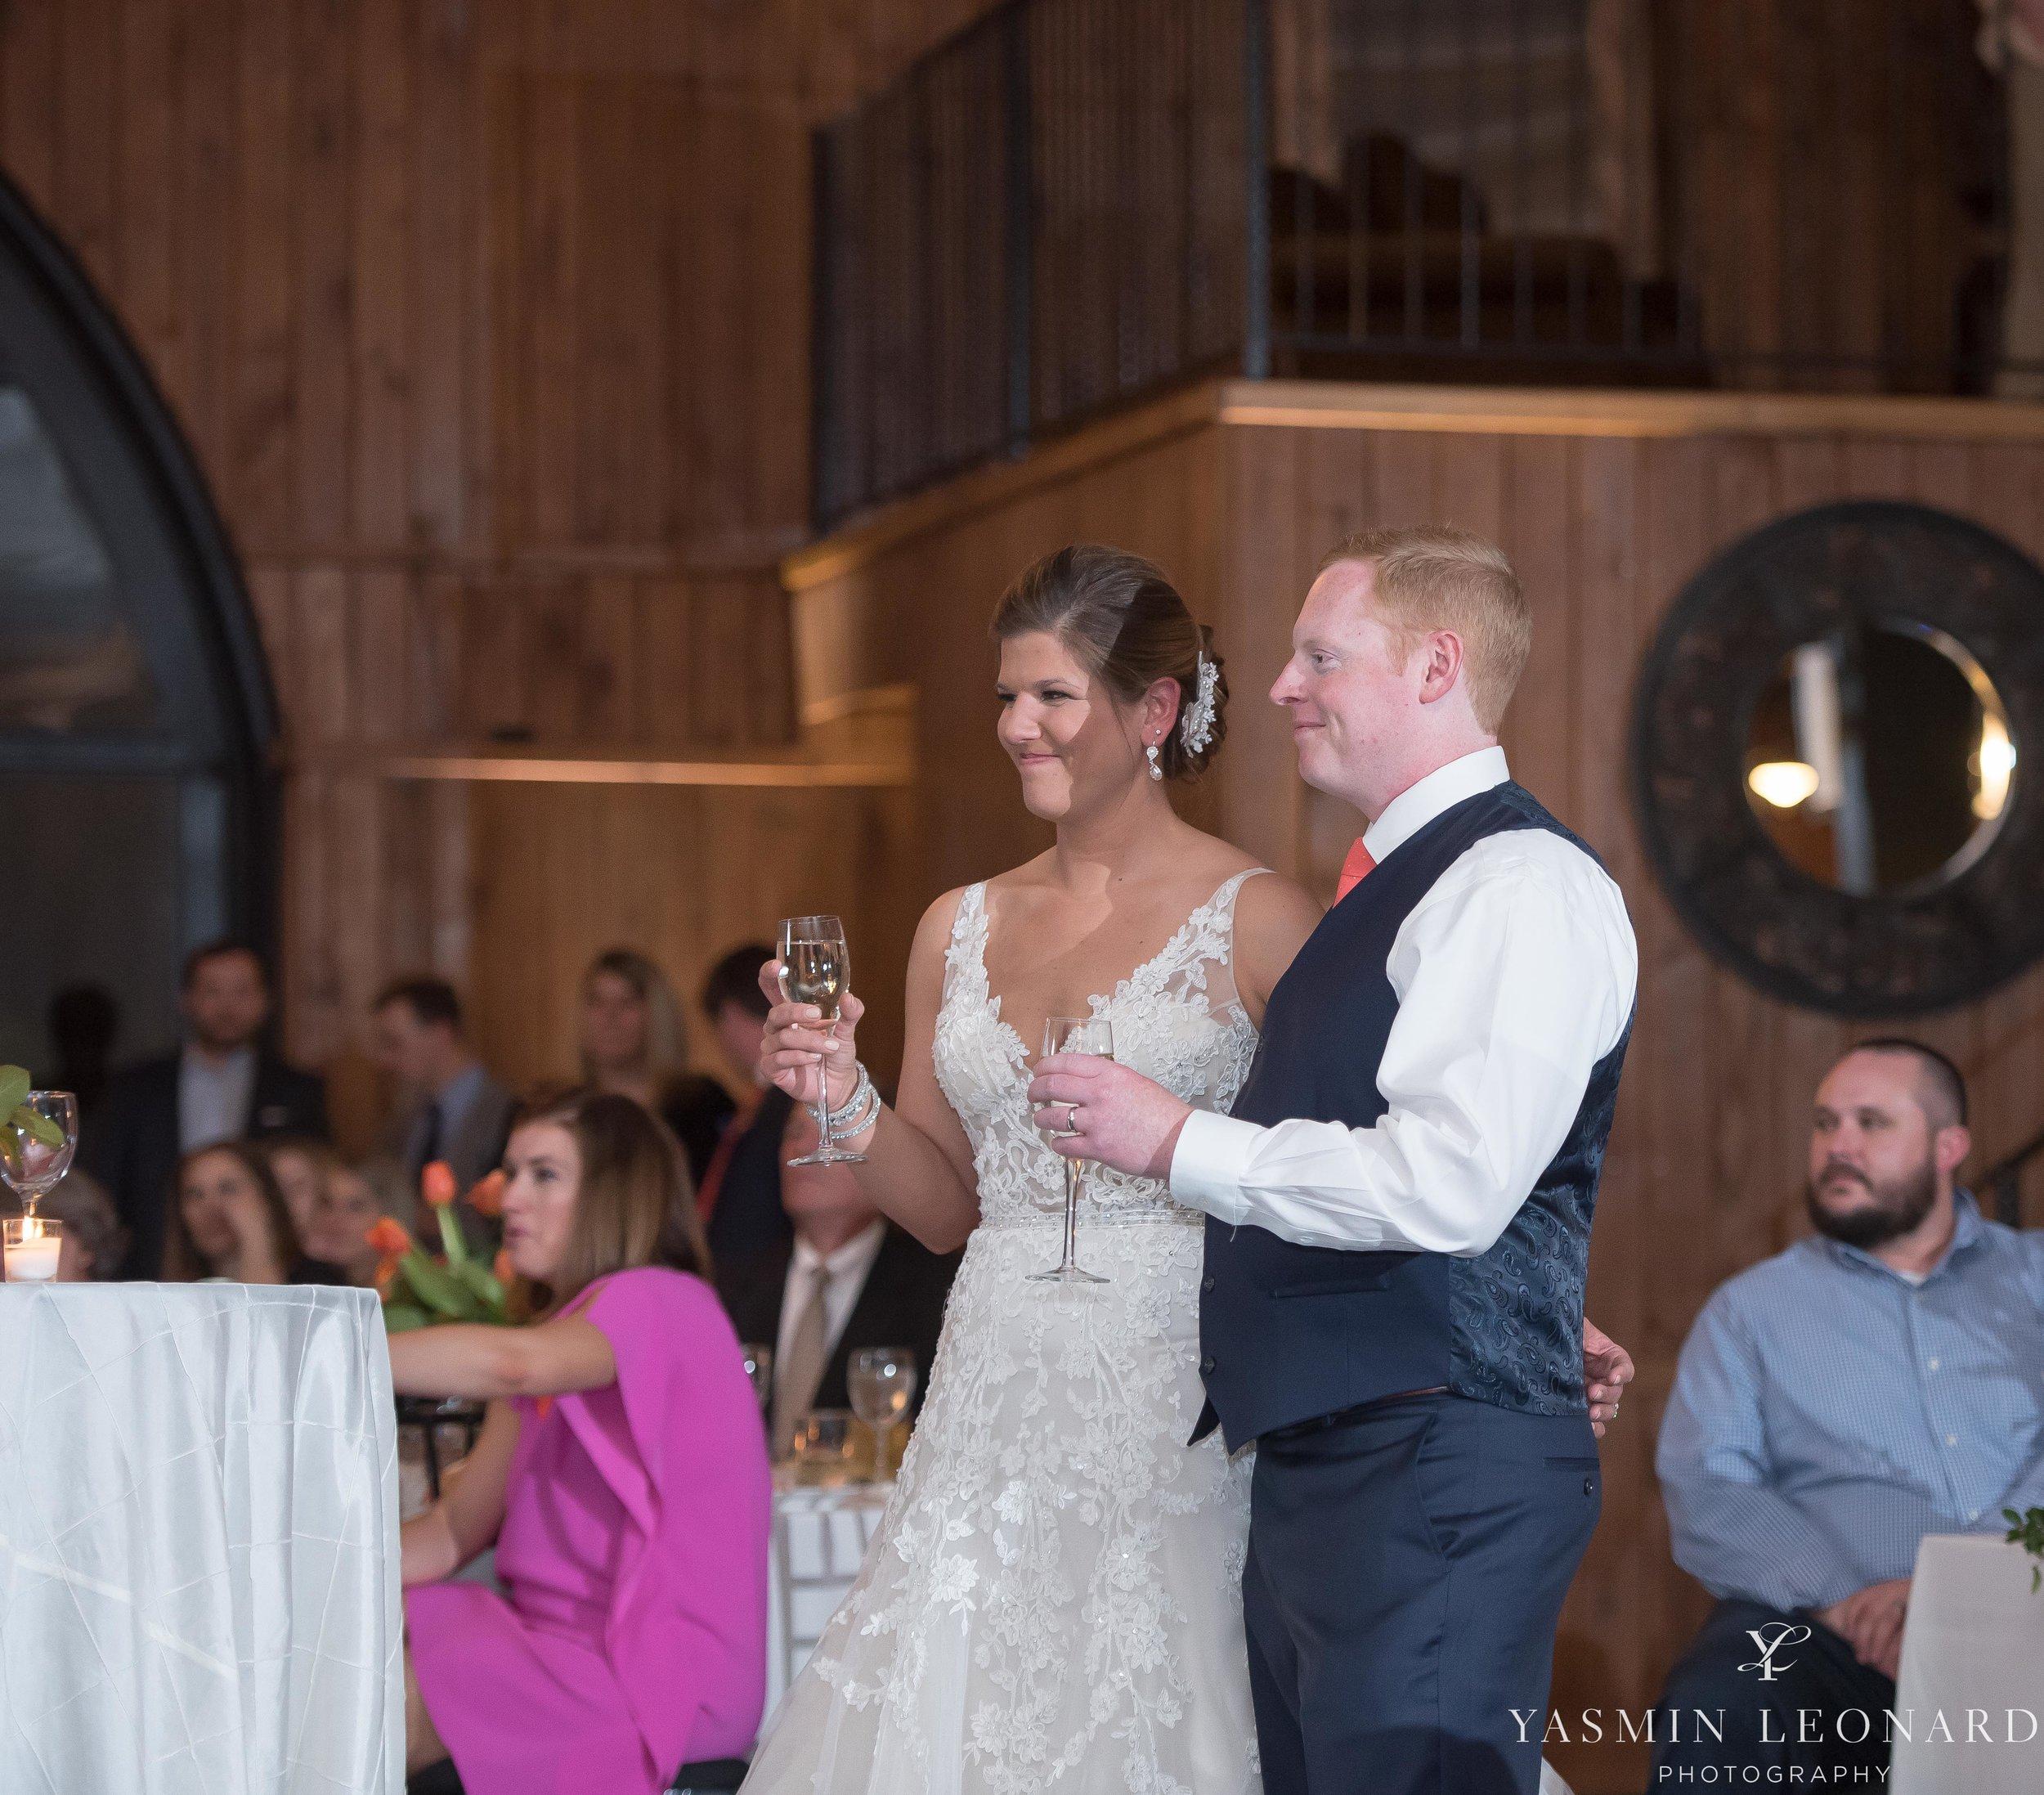 Adaumont Farm - Adaumont Farm Weddings - Trinity Weddings - NC Weddings - Yasmin Leonard Photography-65.jpg